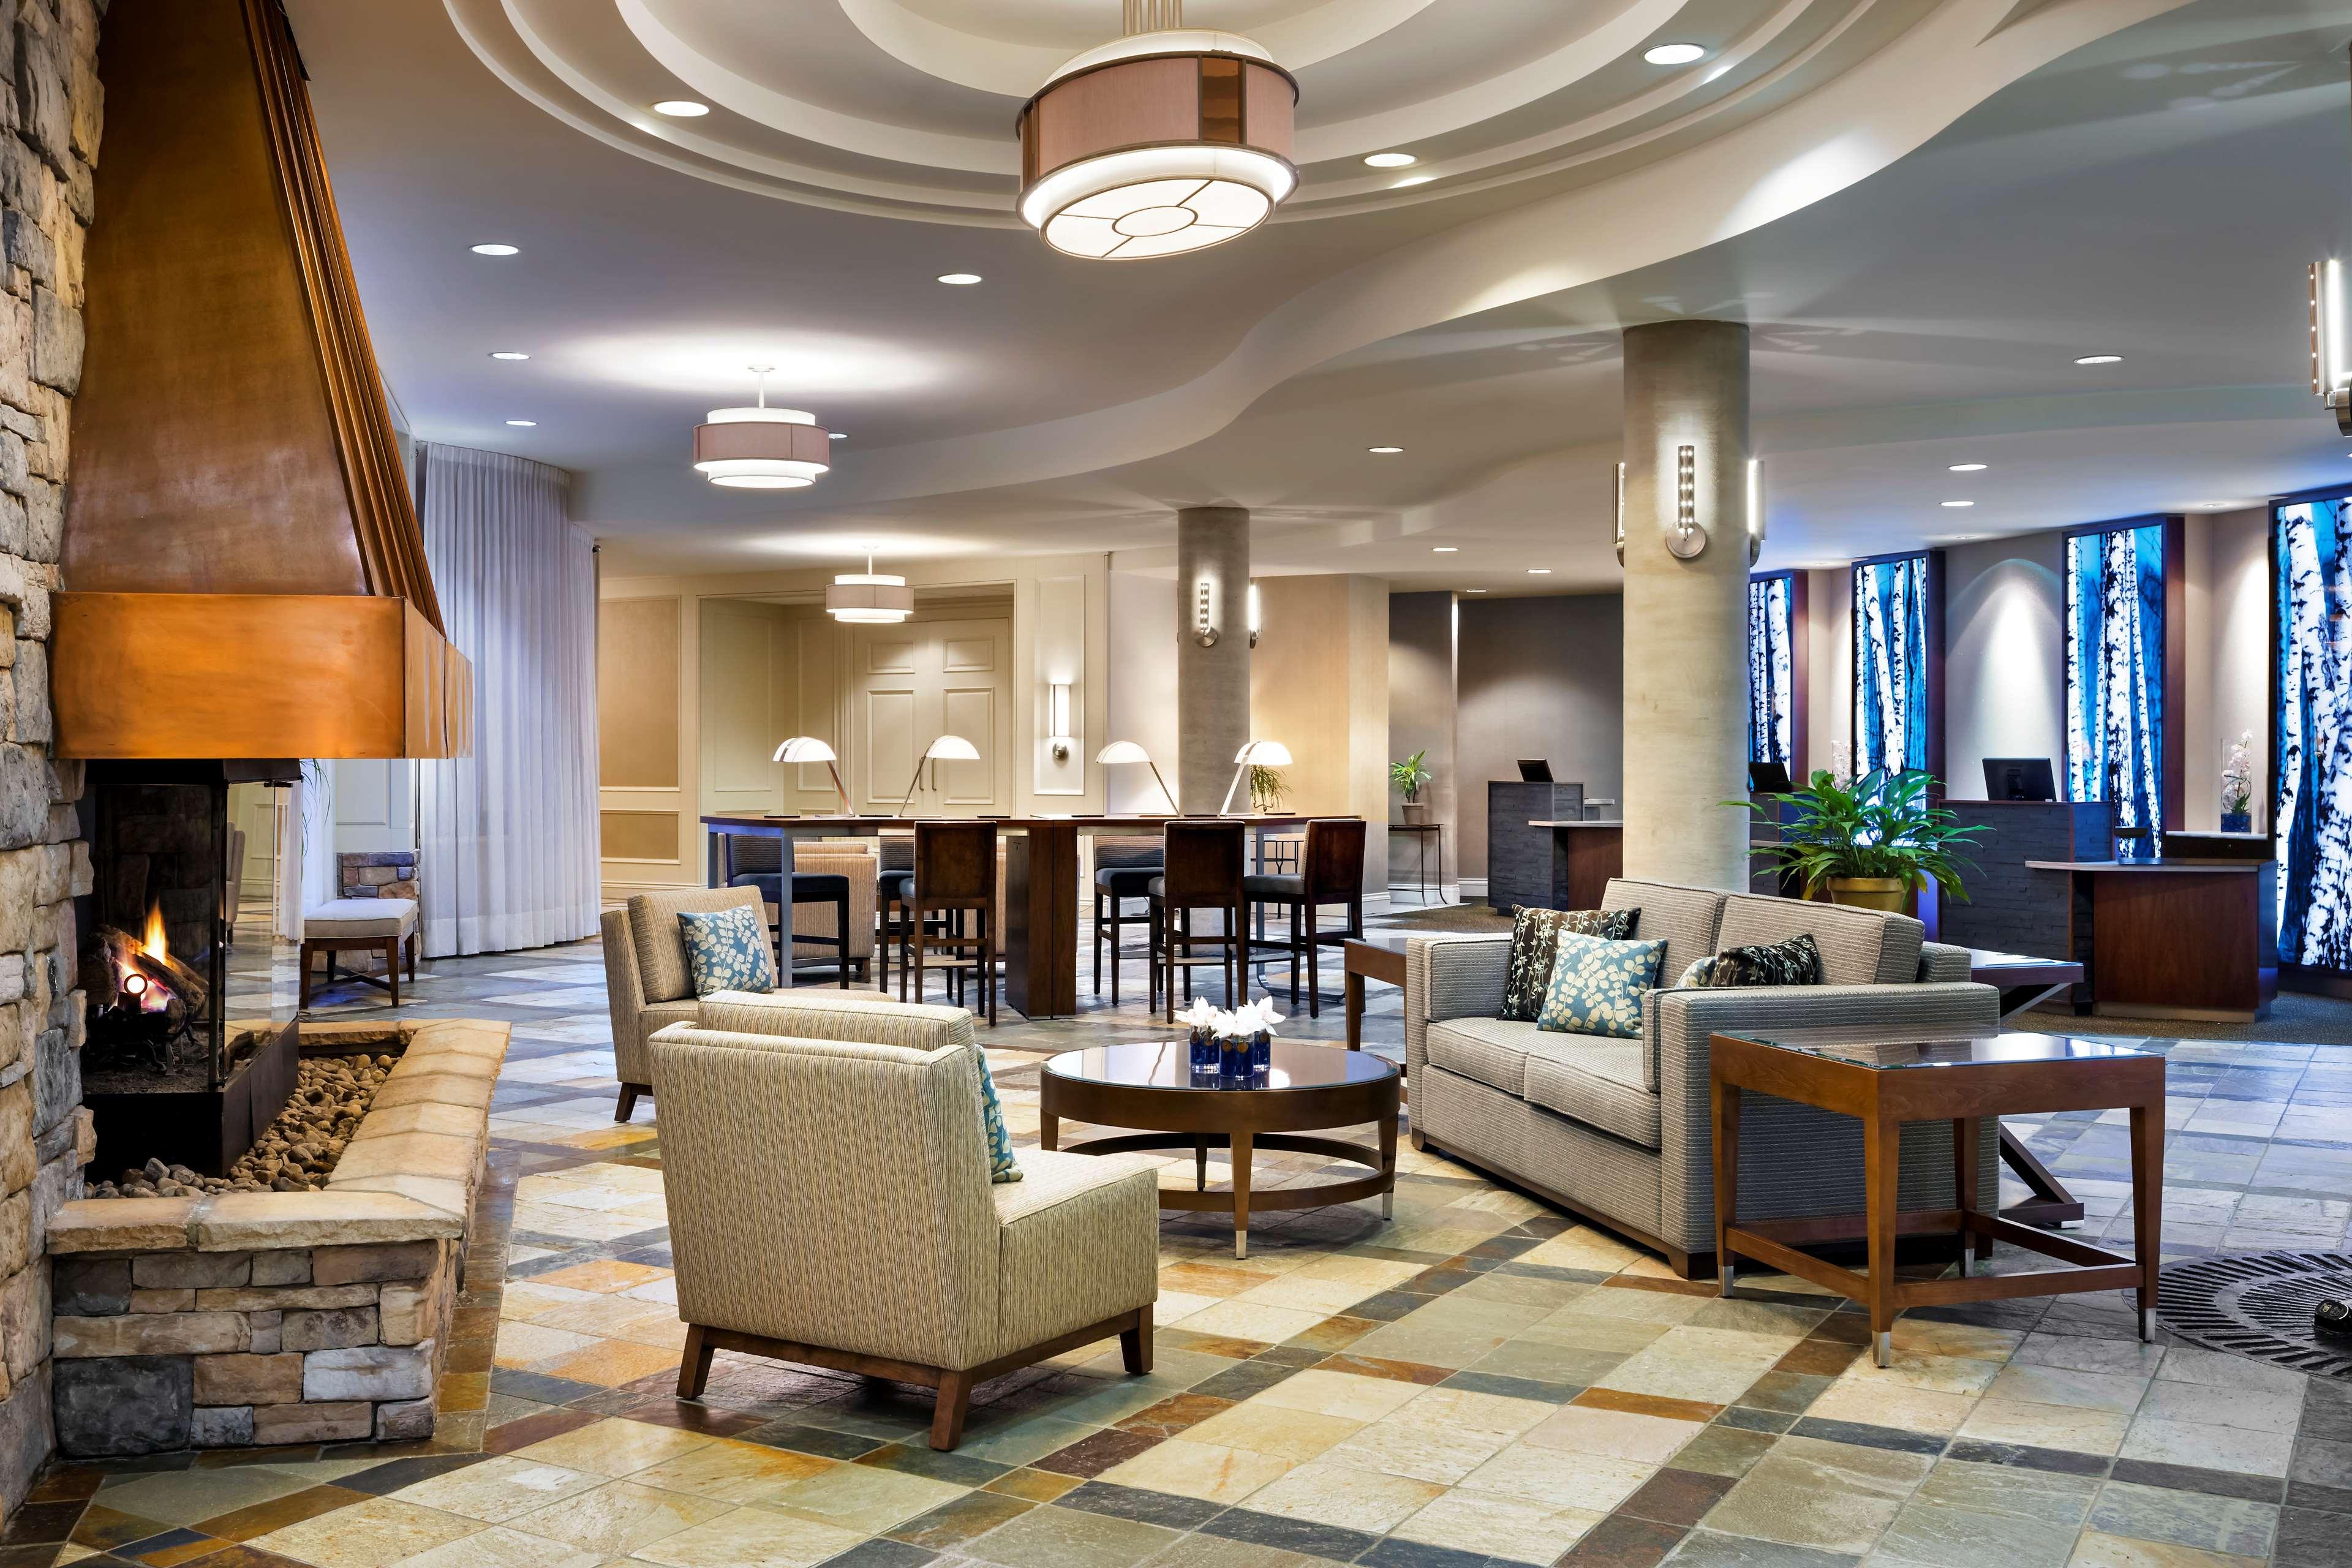 Le Westin Resort & Spa, Tremblant, Quebec à Mont Tremblant: Lobby and front desk area